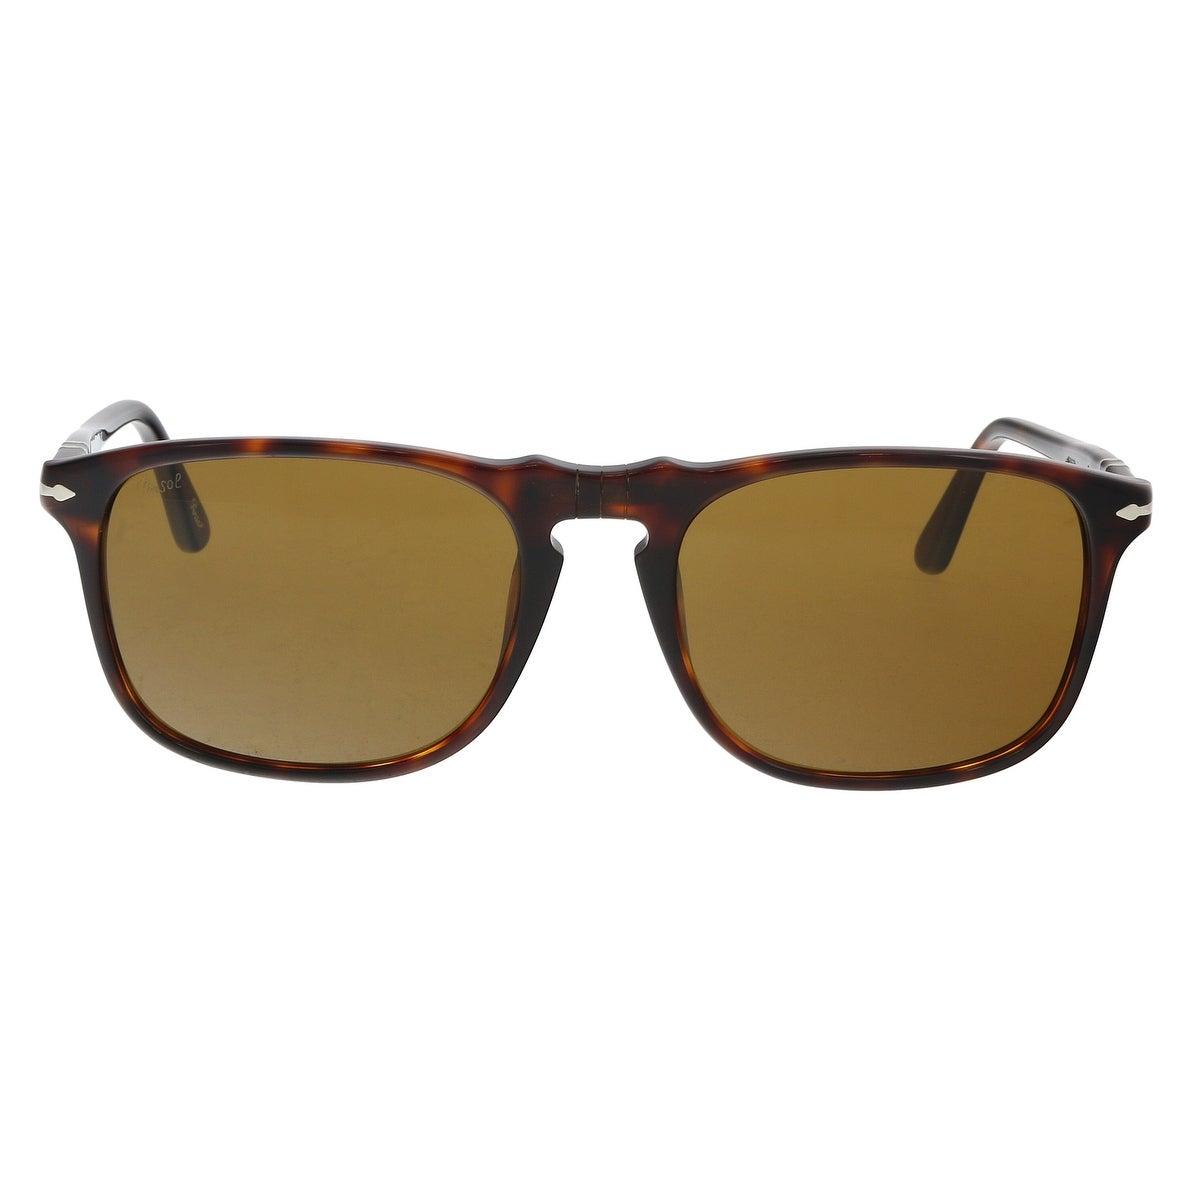 61f69c8d0c Shop PERSOL PO3059S 24 33 Havana Rectangle Sunglasses - 54-18-145 - Ships  To Canada - - 21158180